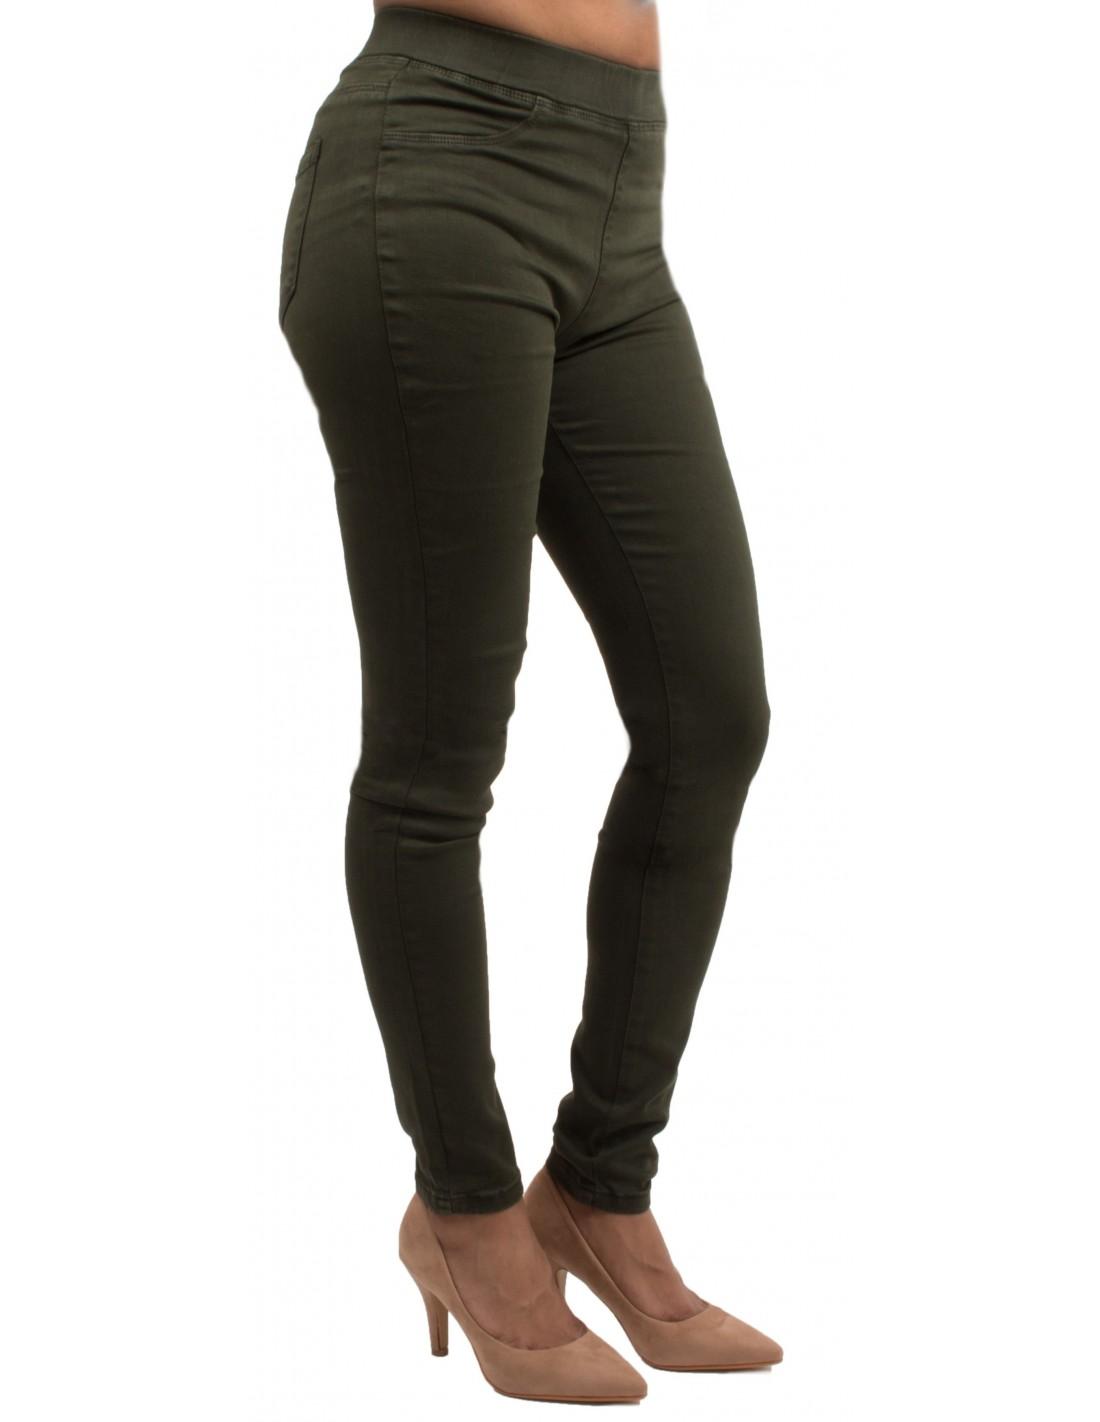 jegging femme kaki taille haute coupe jean slim ultra stretch. Black Bedroom Furniture Sets. Home Design Ideas